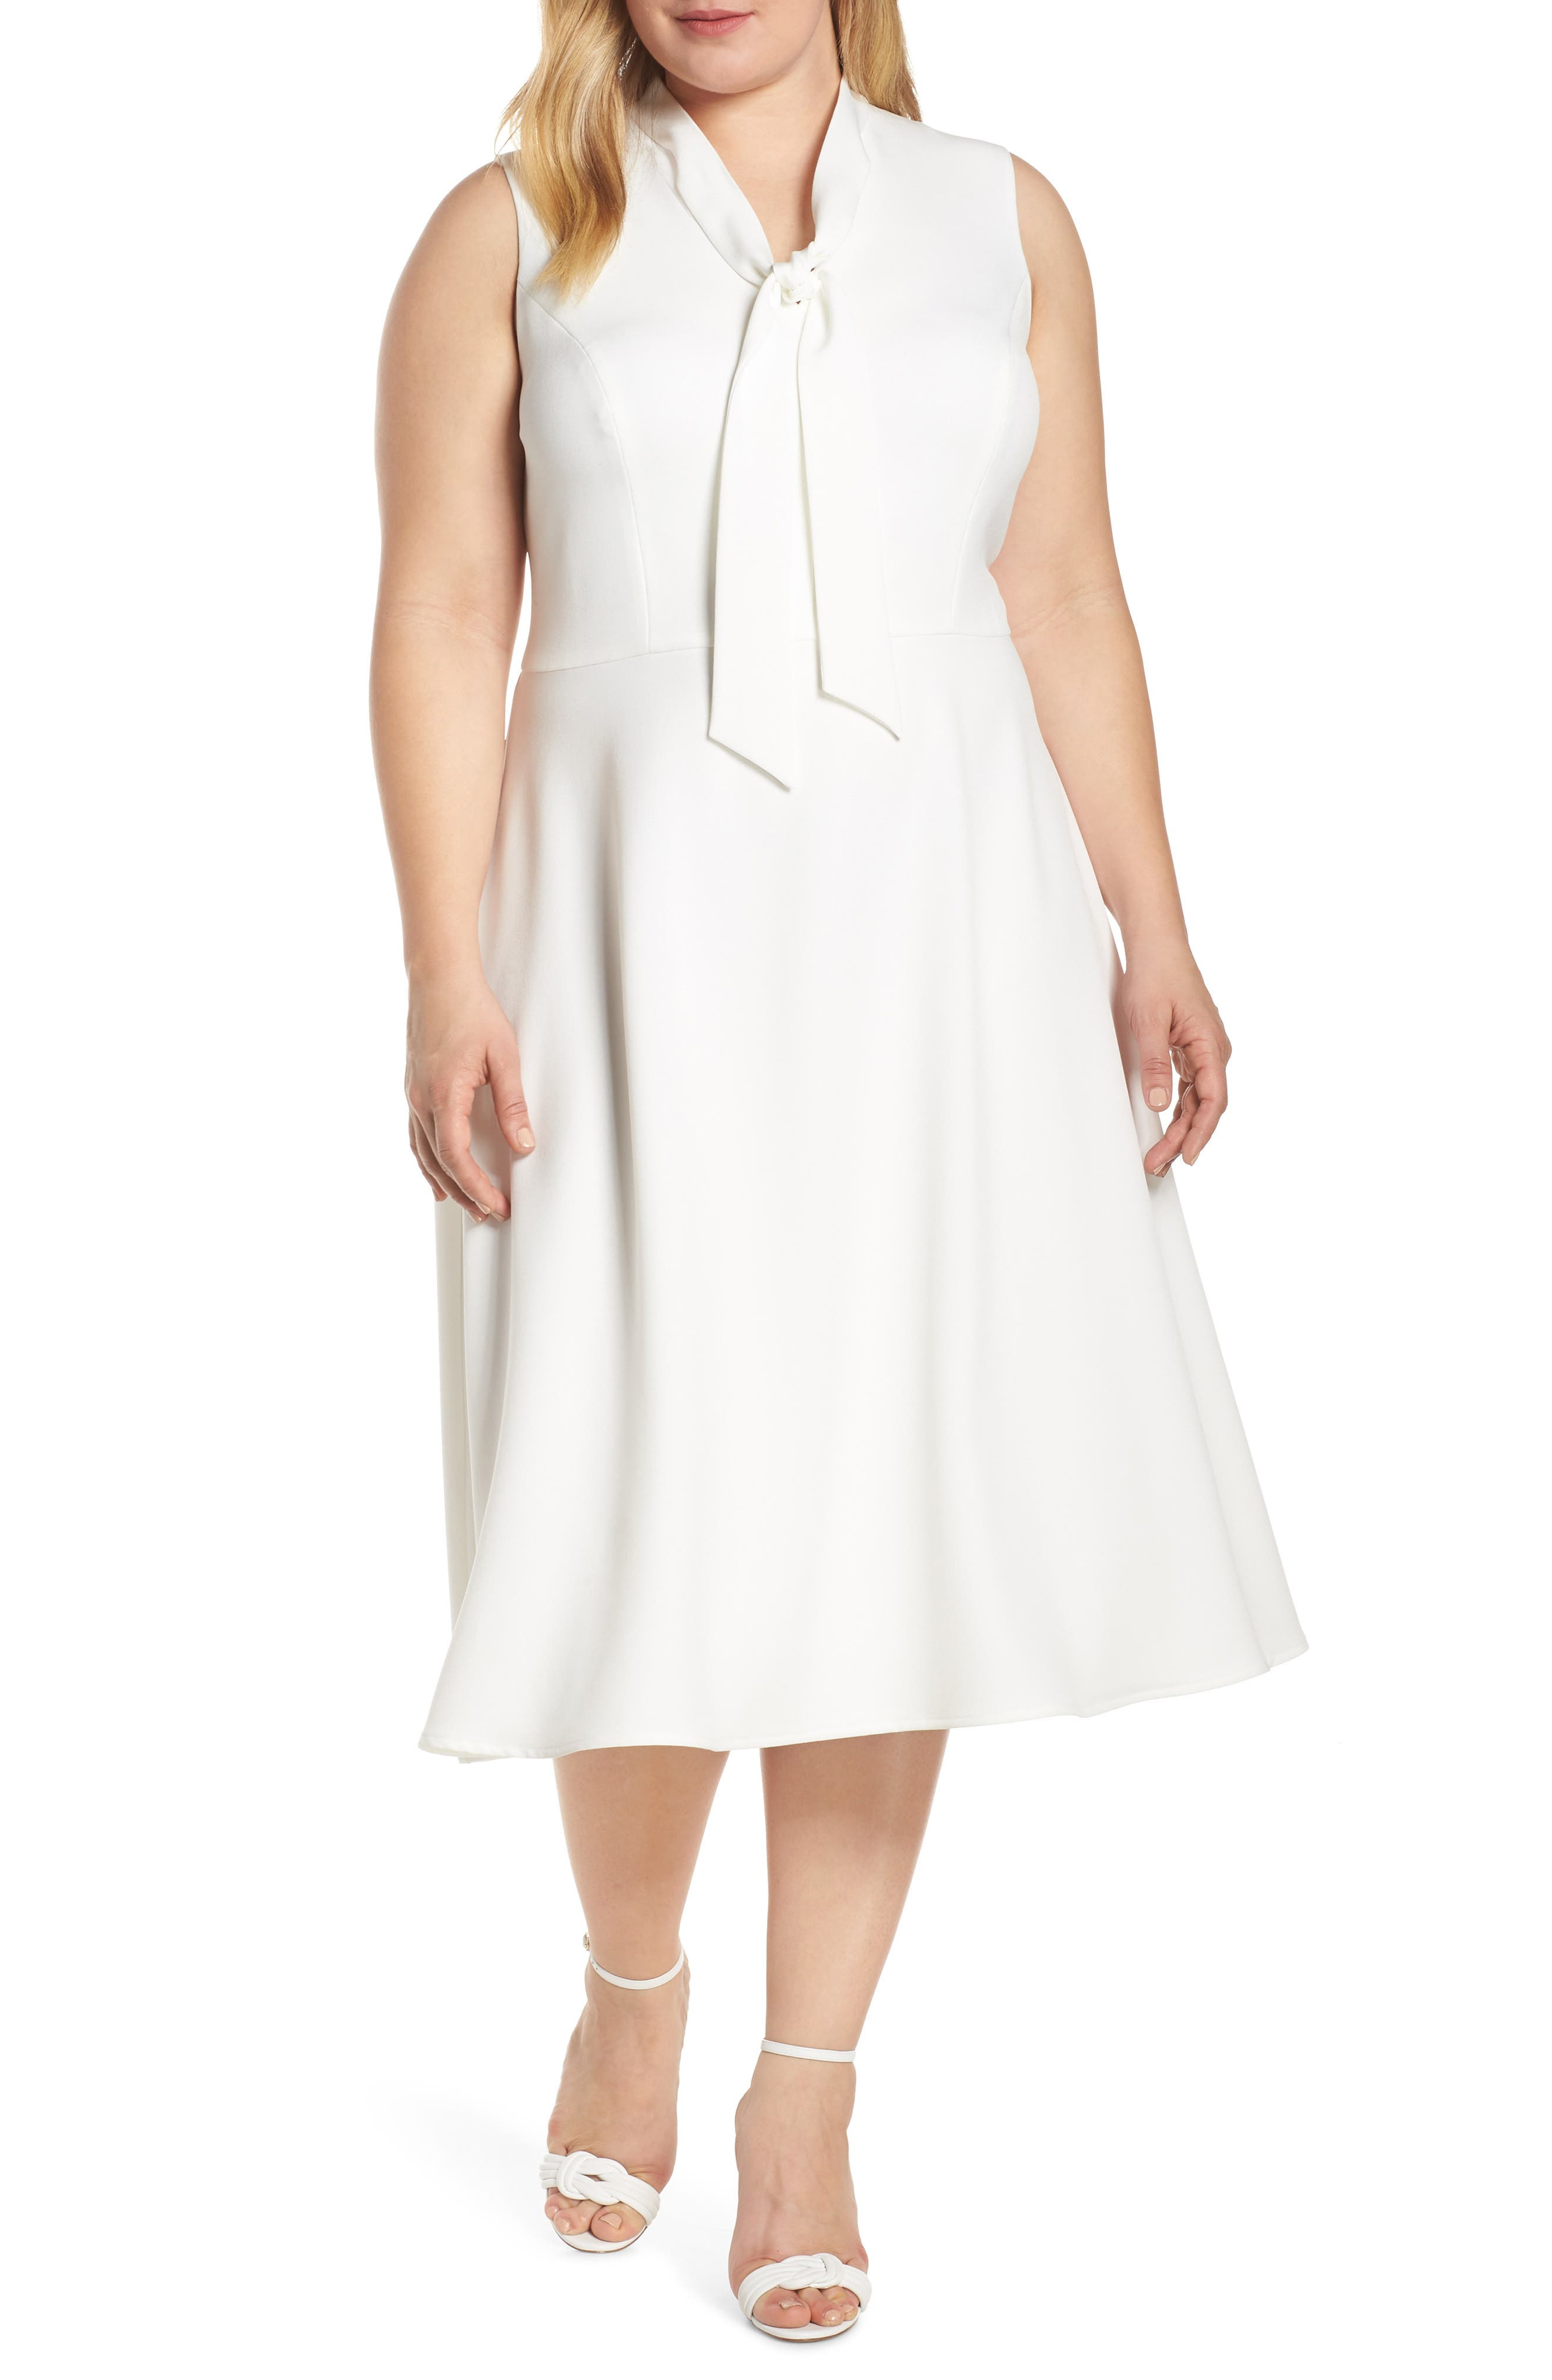 1920s Day Dresses, Tea Dresses, Mature Dresses with Sleeves Plus Size Womens Maggy London Ruthie Tie Neck Crepe Dress $148.00 AT vintagedancer.com